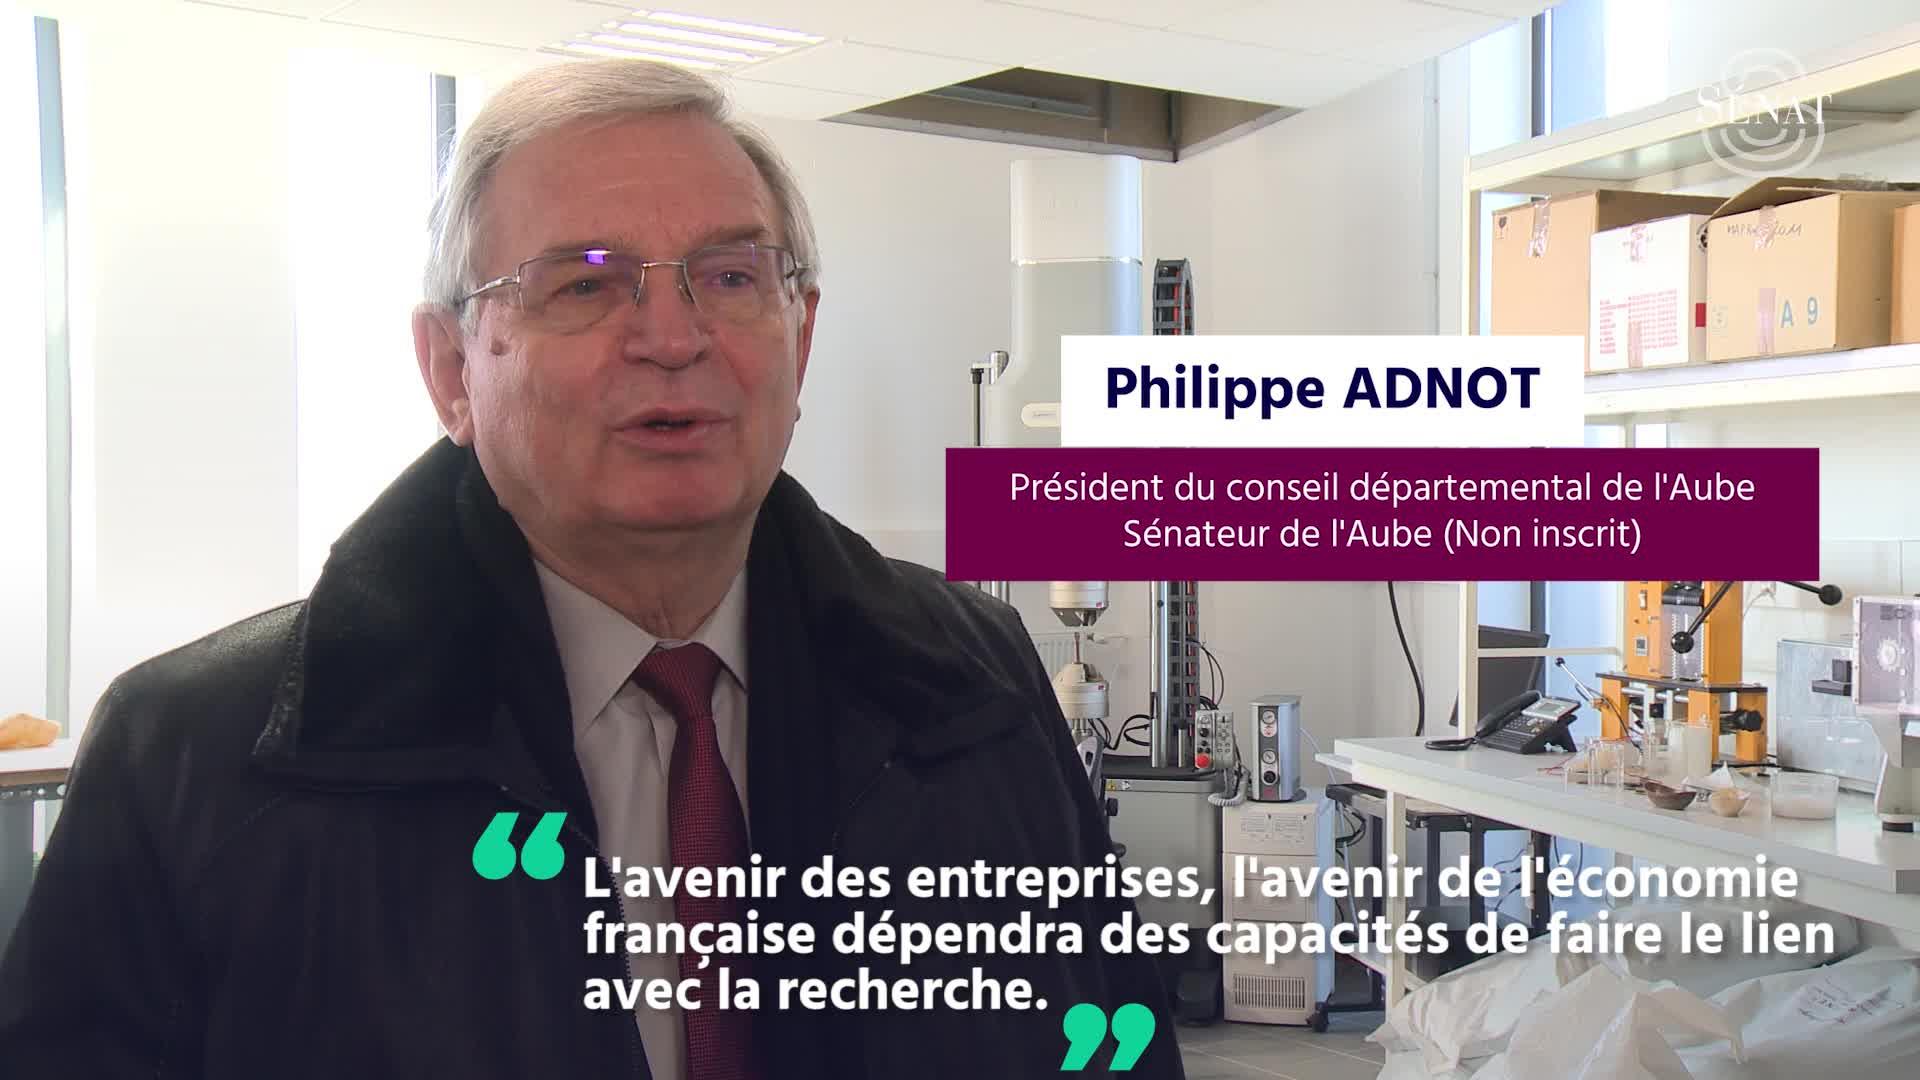 rencontre video direct Compiègne